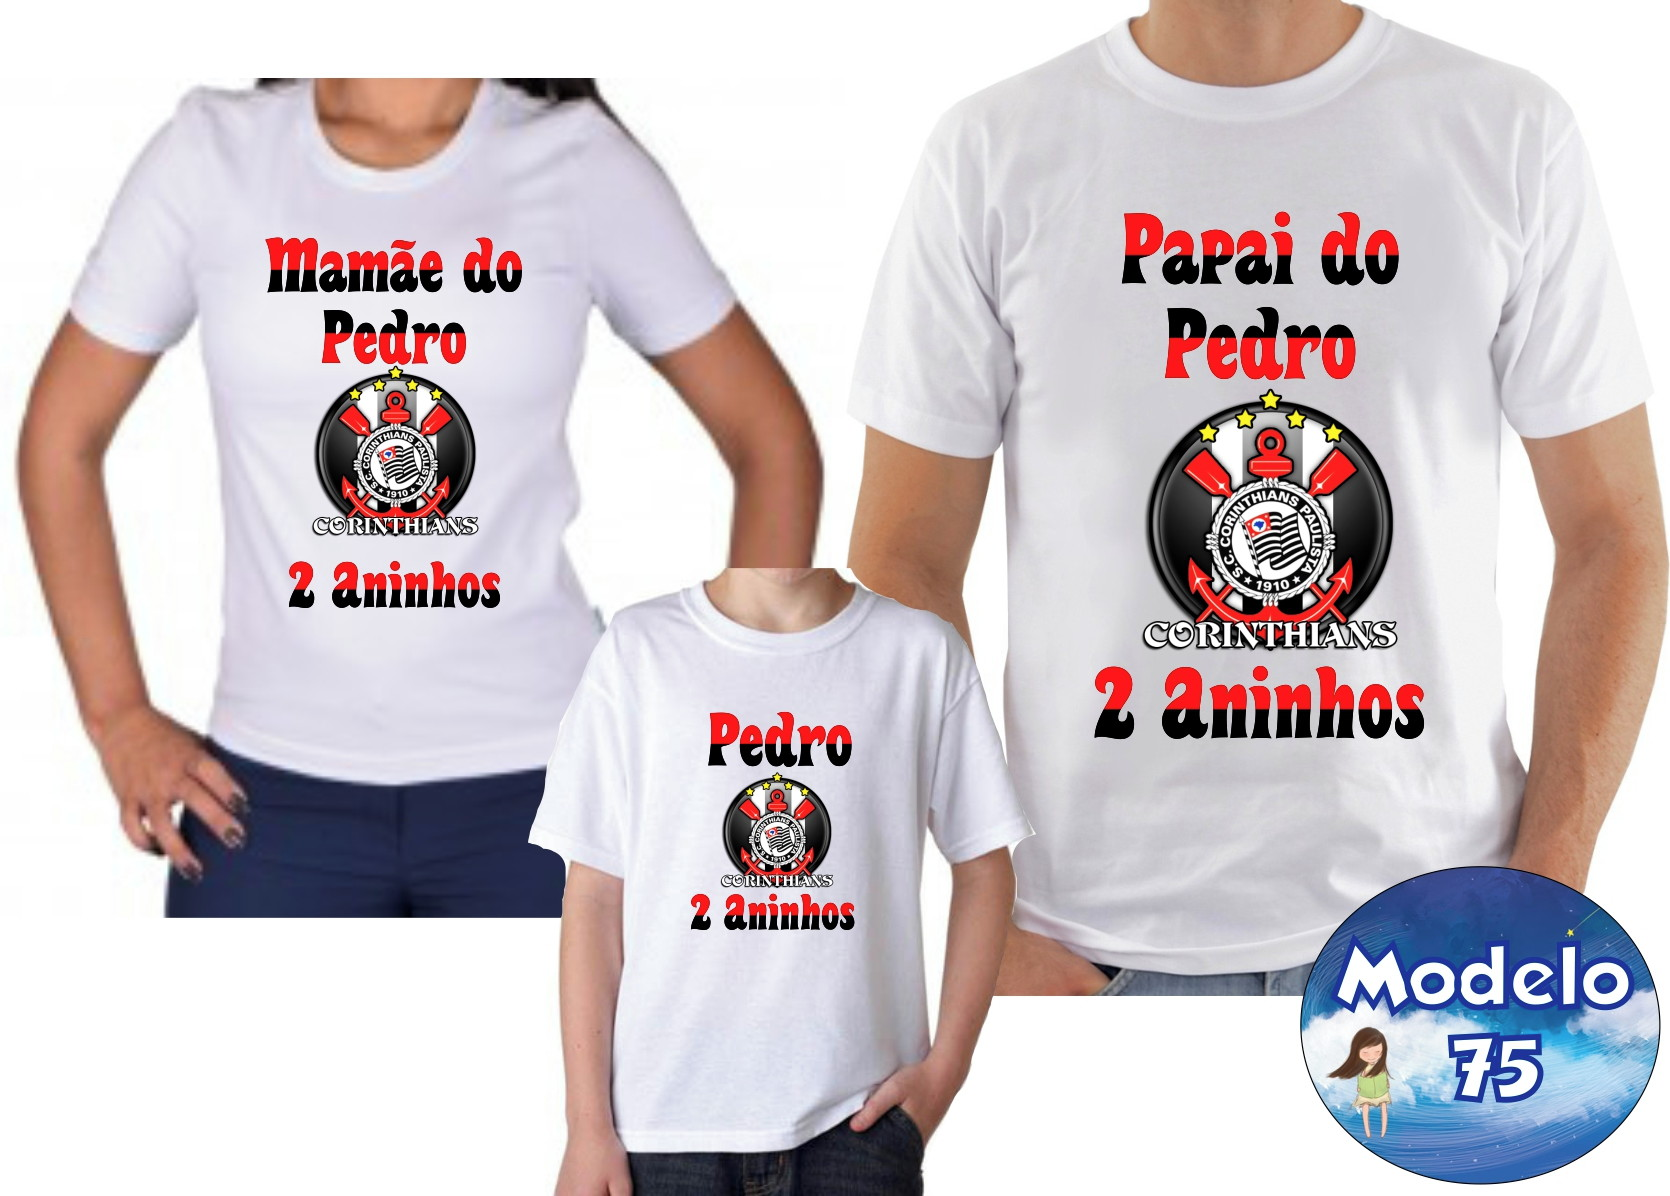 77c6ffe8d60f8 Camisa Camiseta Personalizada Time de Futebol Corinthians 3